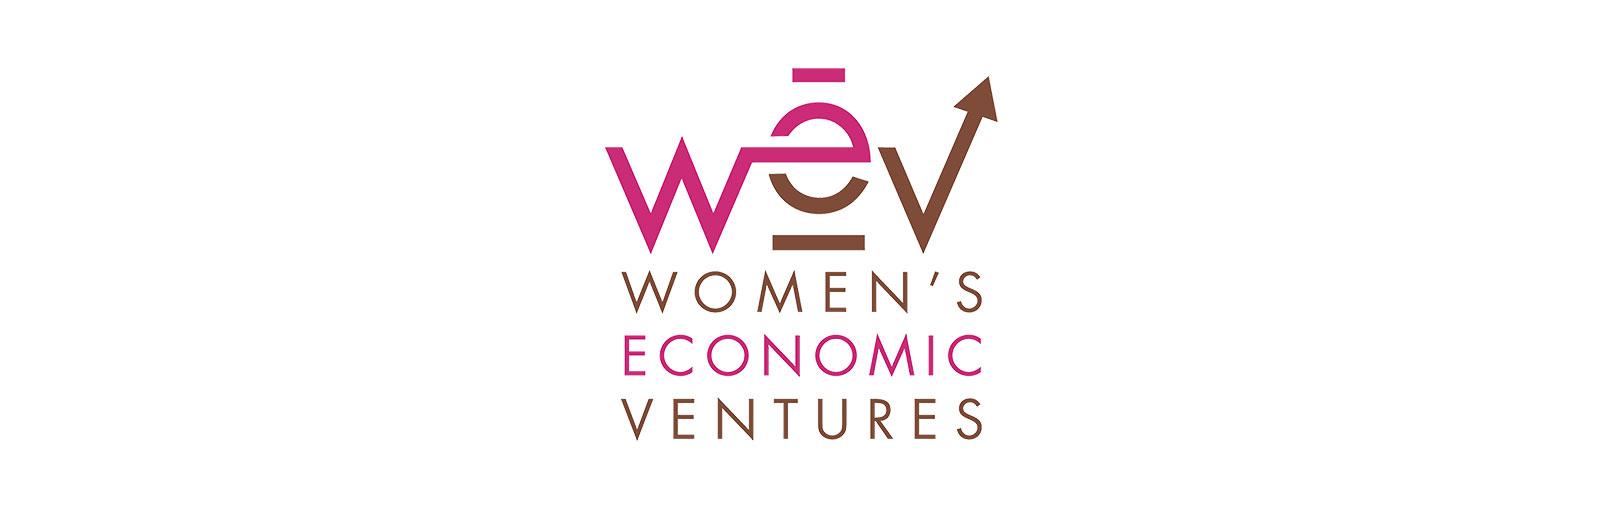 partners-logo-WEV